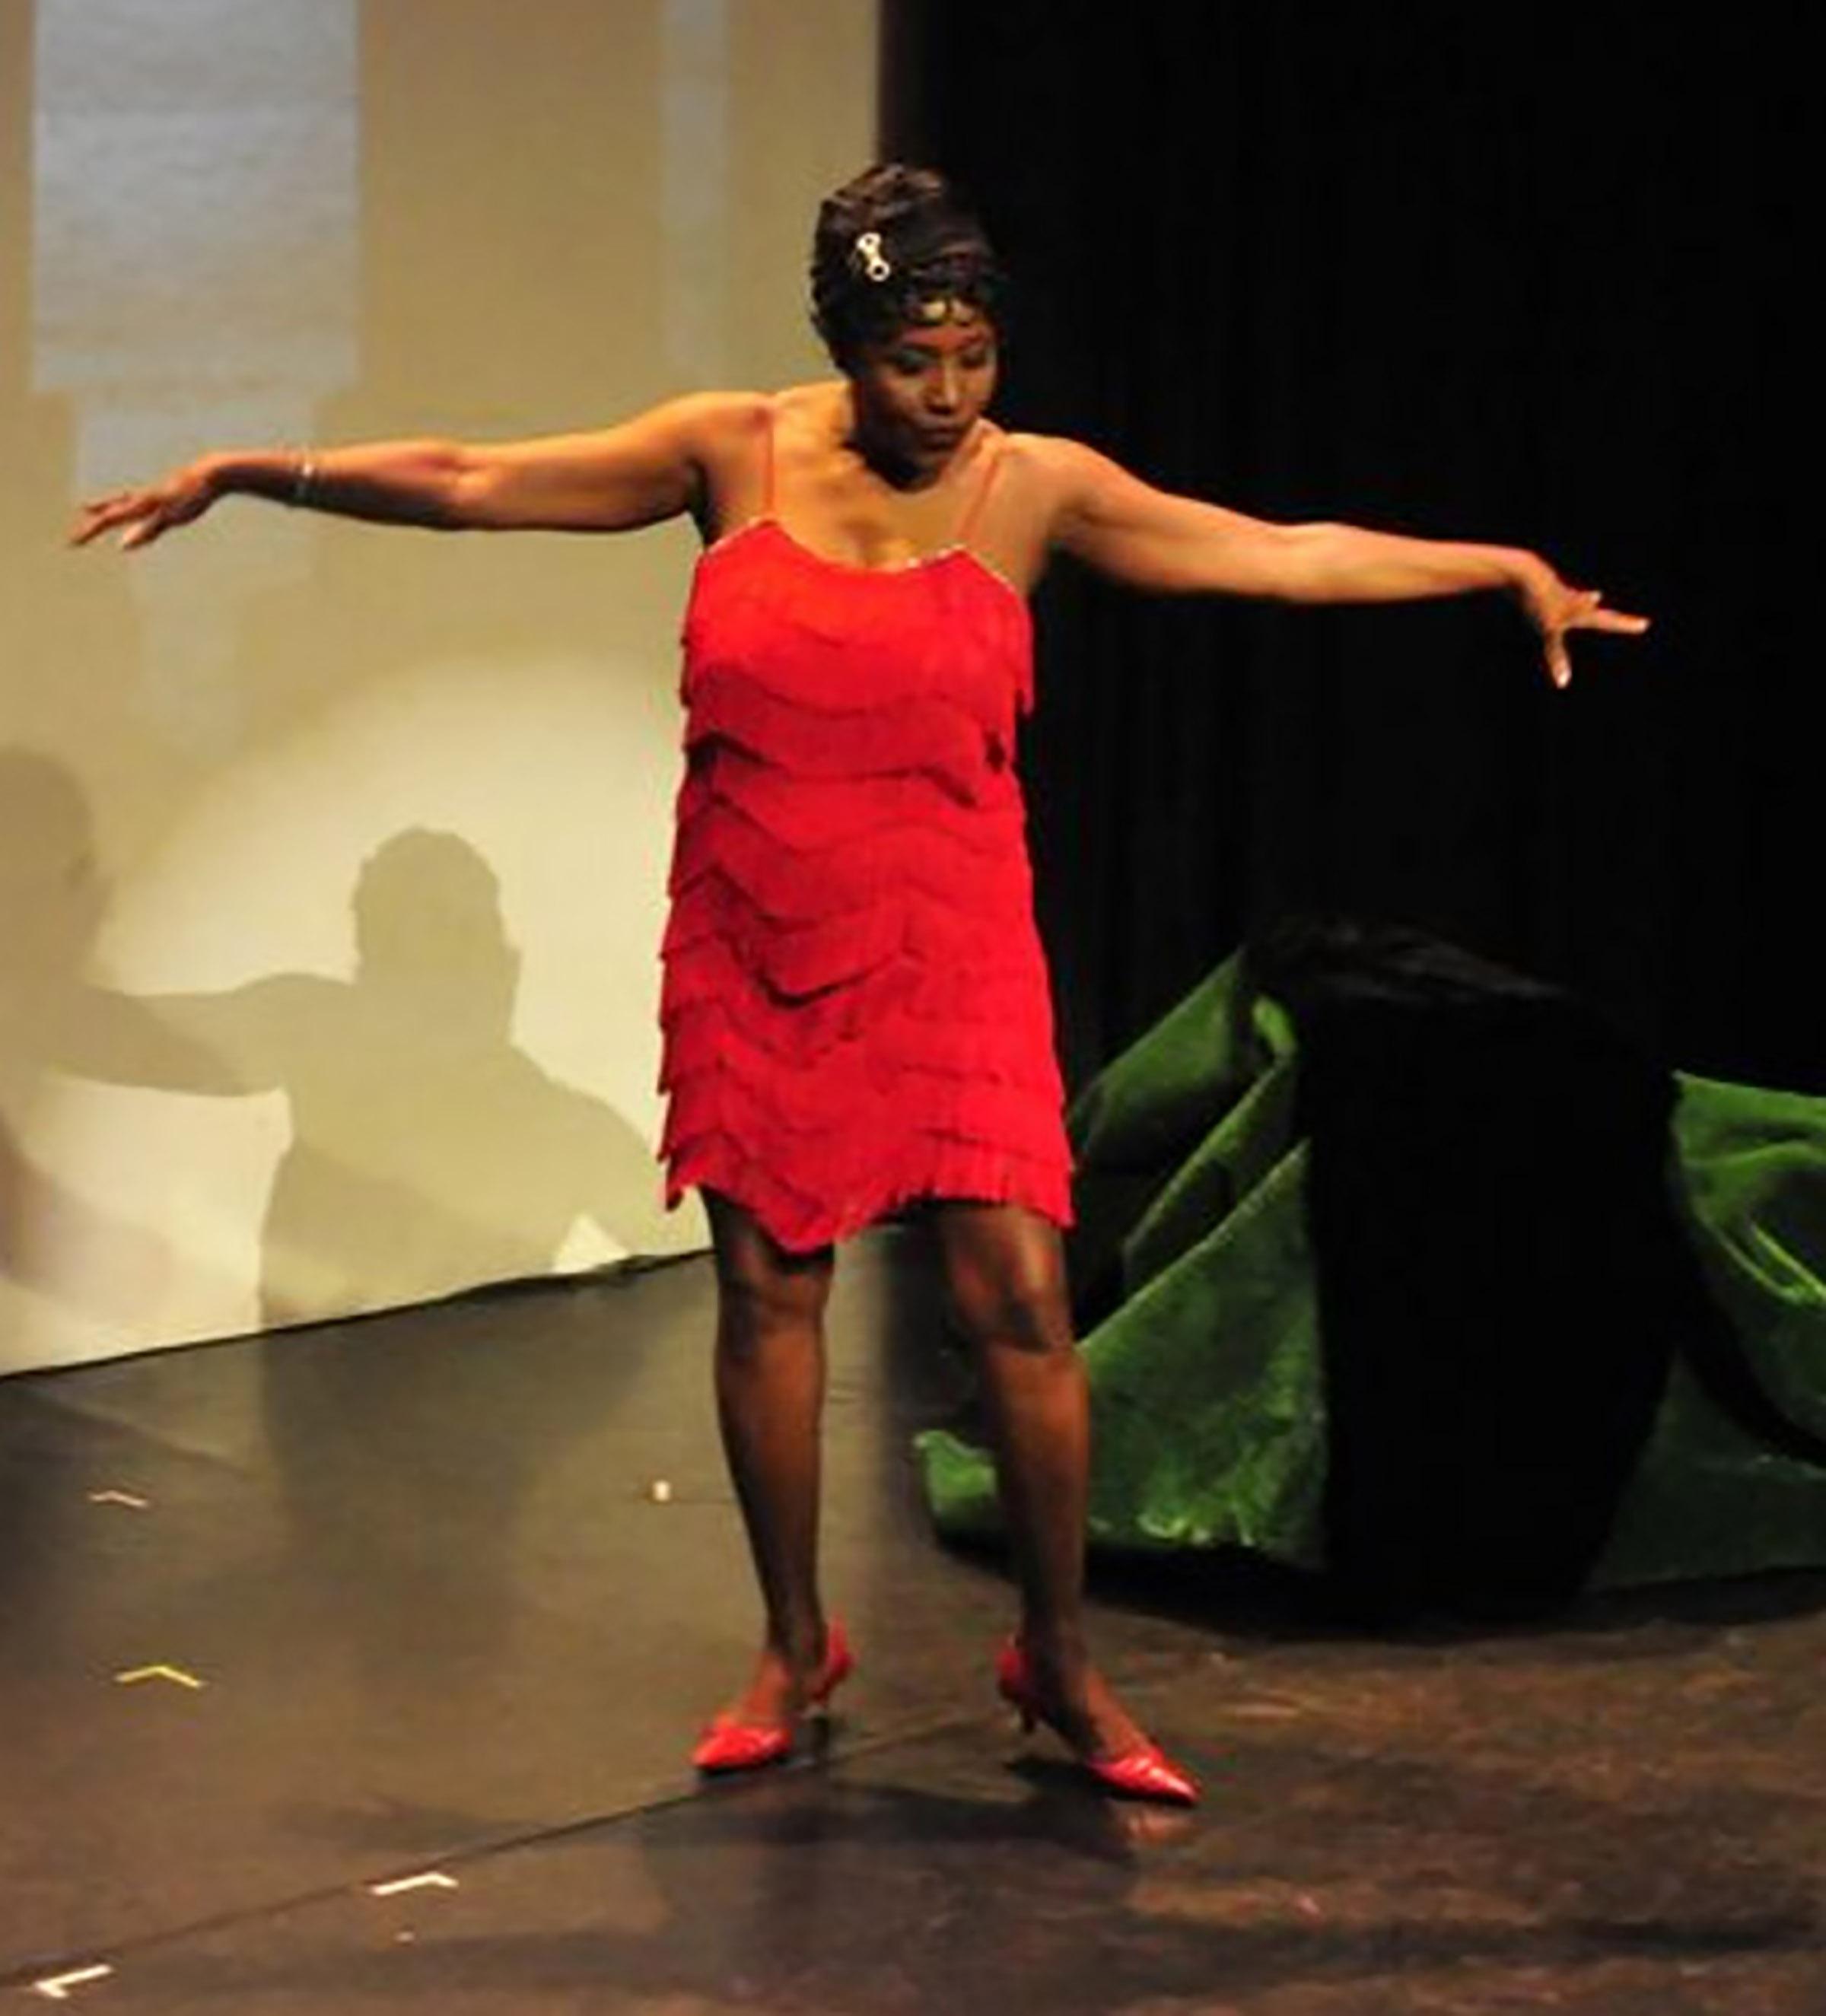 Rose as Ethel_Arms long-2.jpg